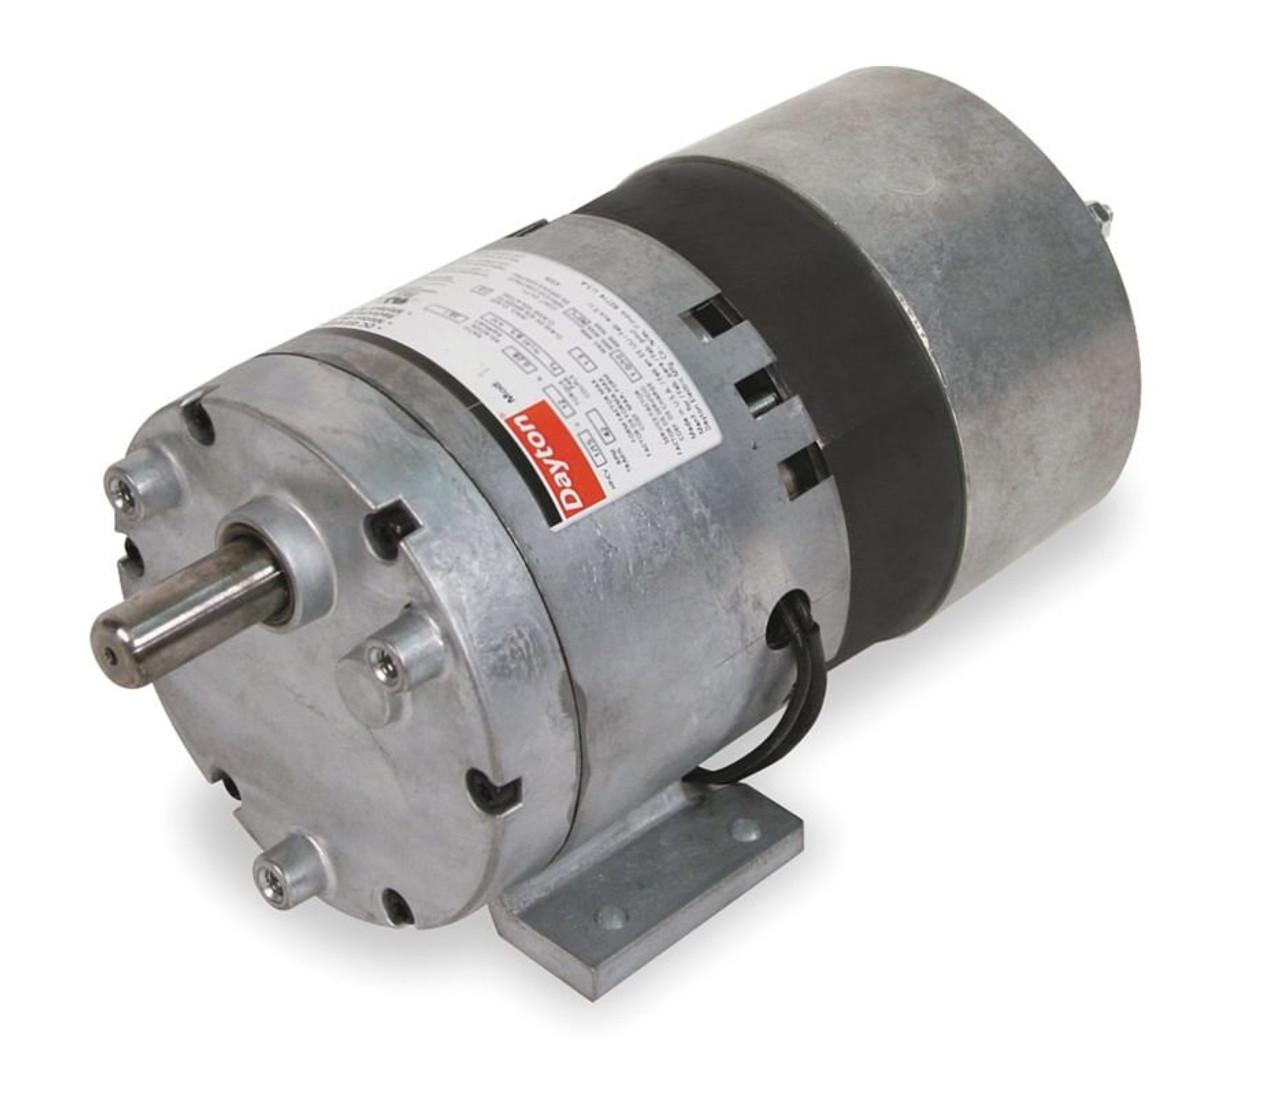 small resolution of  dayton model 1lpl6 gear motor 60 rpm 1 10 hp 115v 3m138 on 76 ly dayton gear motor wiring diagram